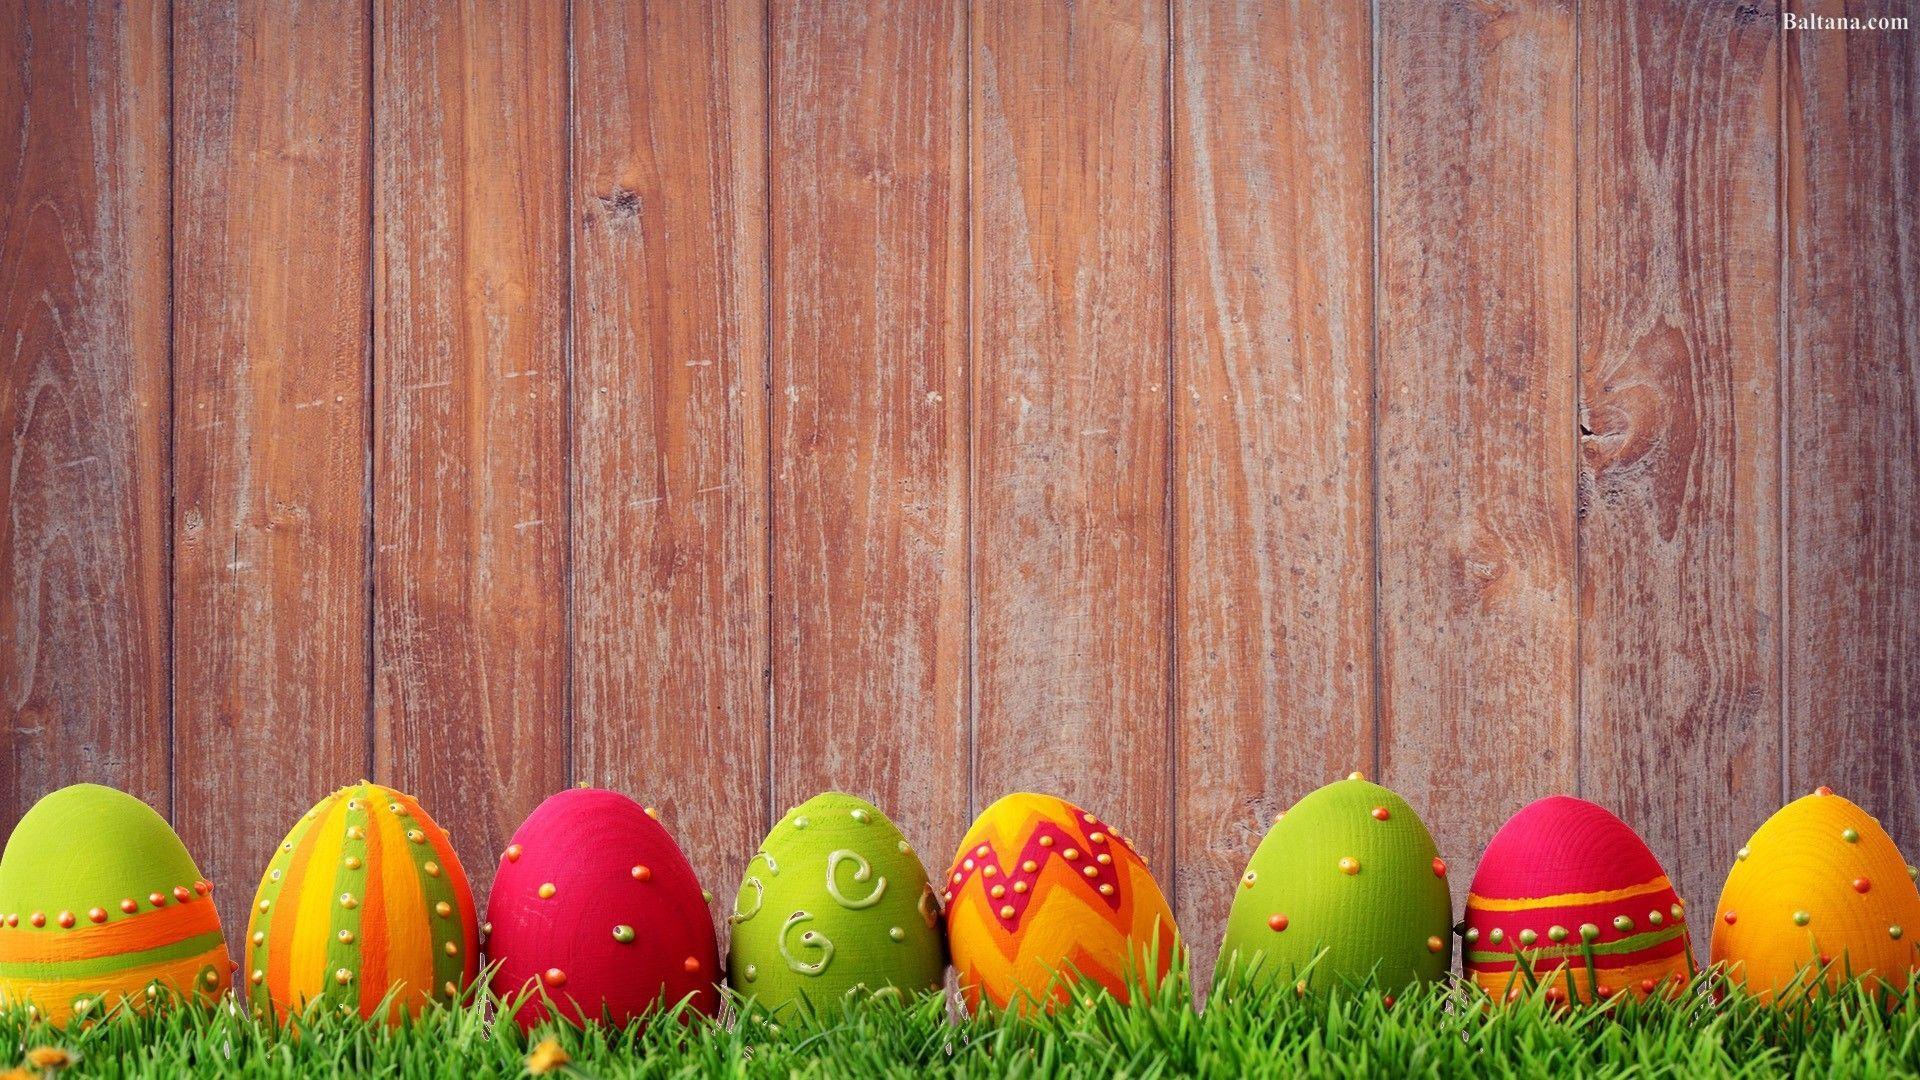 Easter Desktop Wallpapers Top Free Easter Desktop Backgrounds Wallpaperaccess